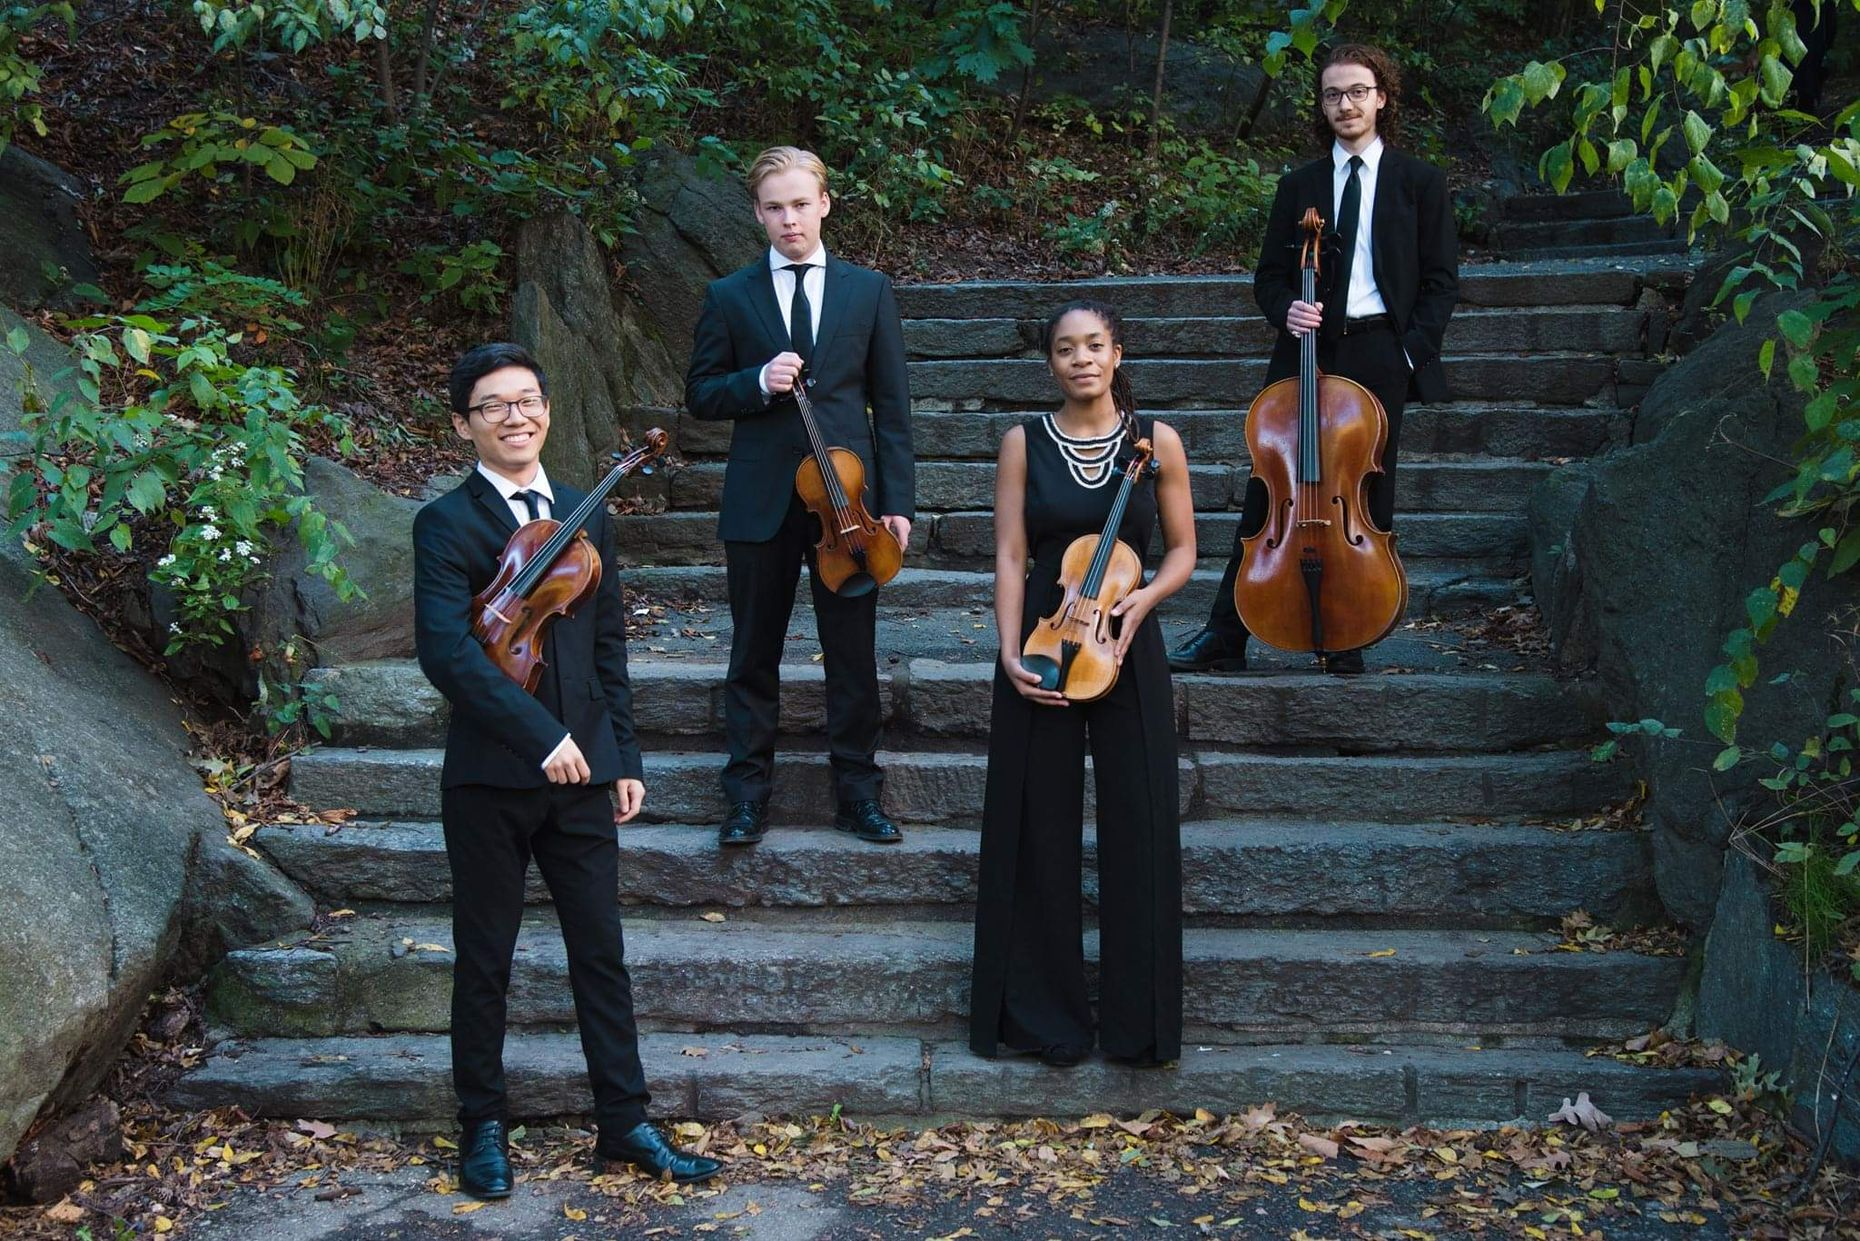 WQXR Presents Midday Masterpieces: Inside Juilliard Chamber Music